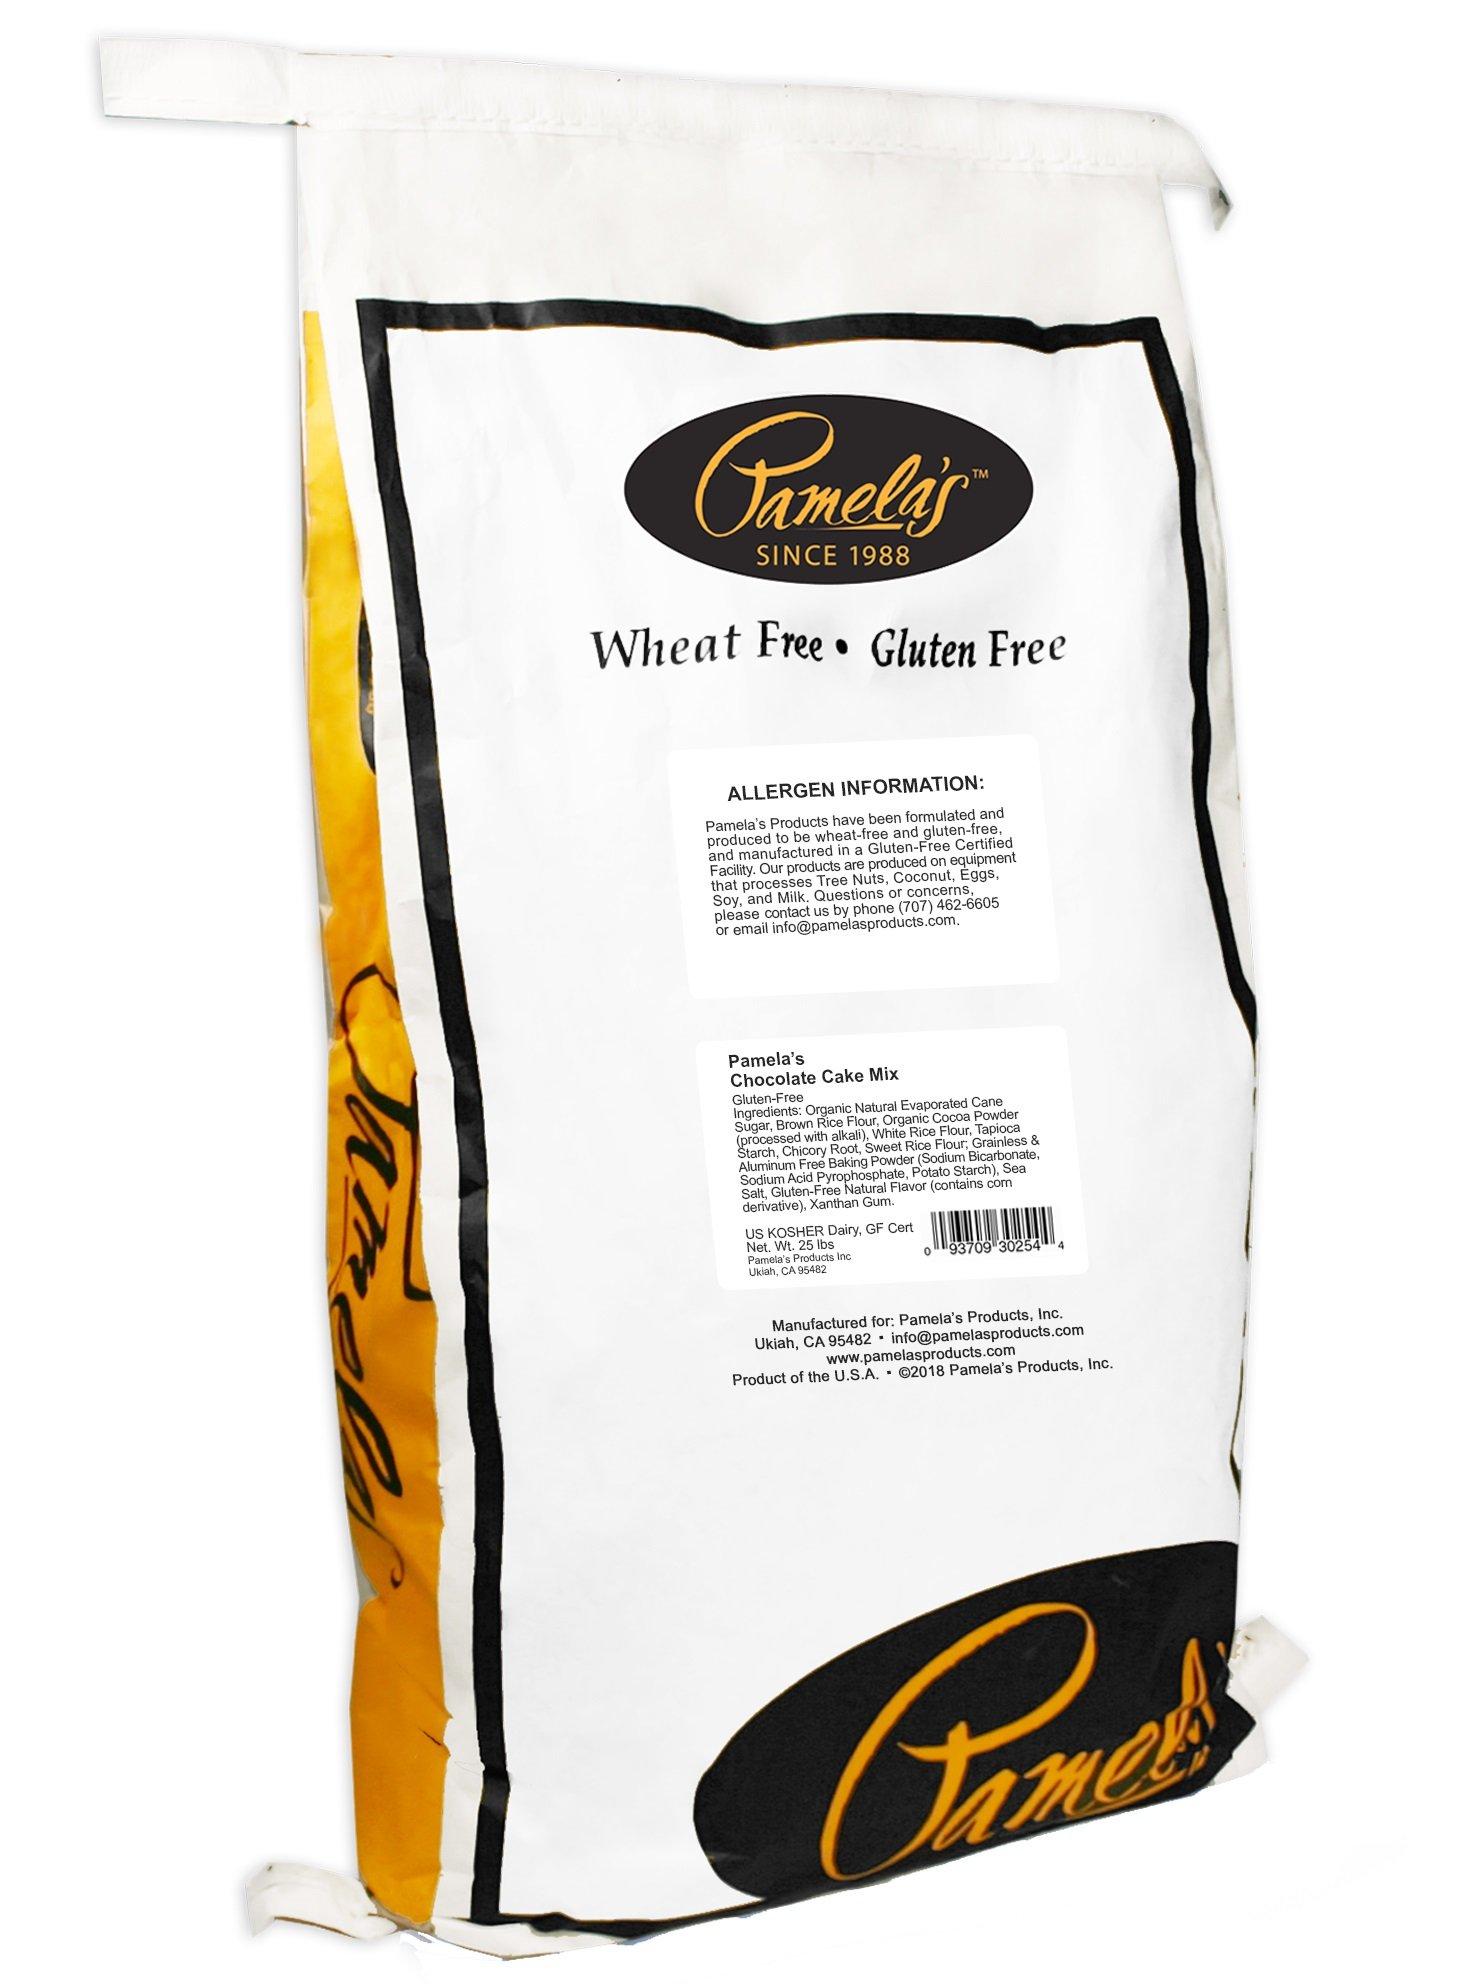 Pamela's Products Gluten Free Cake Mix, Chocolate Cake, 25-Pound Bag by Pamela's Products